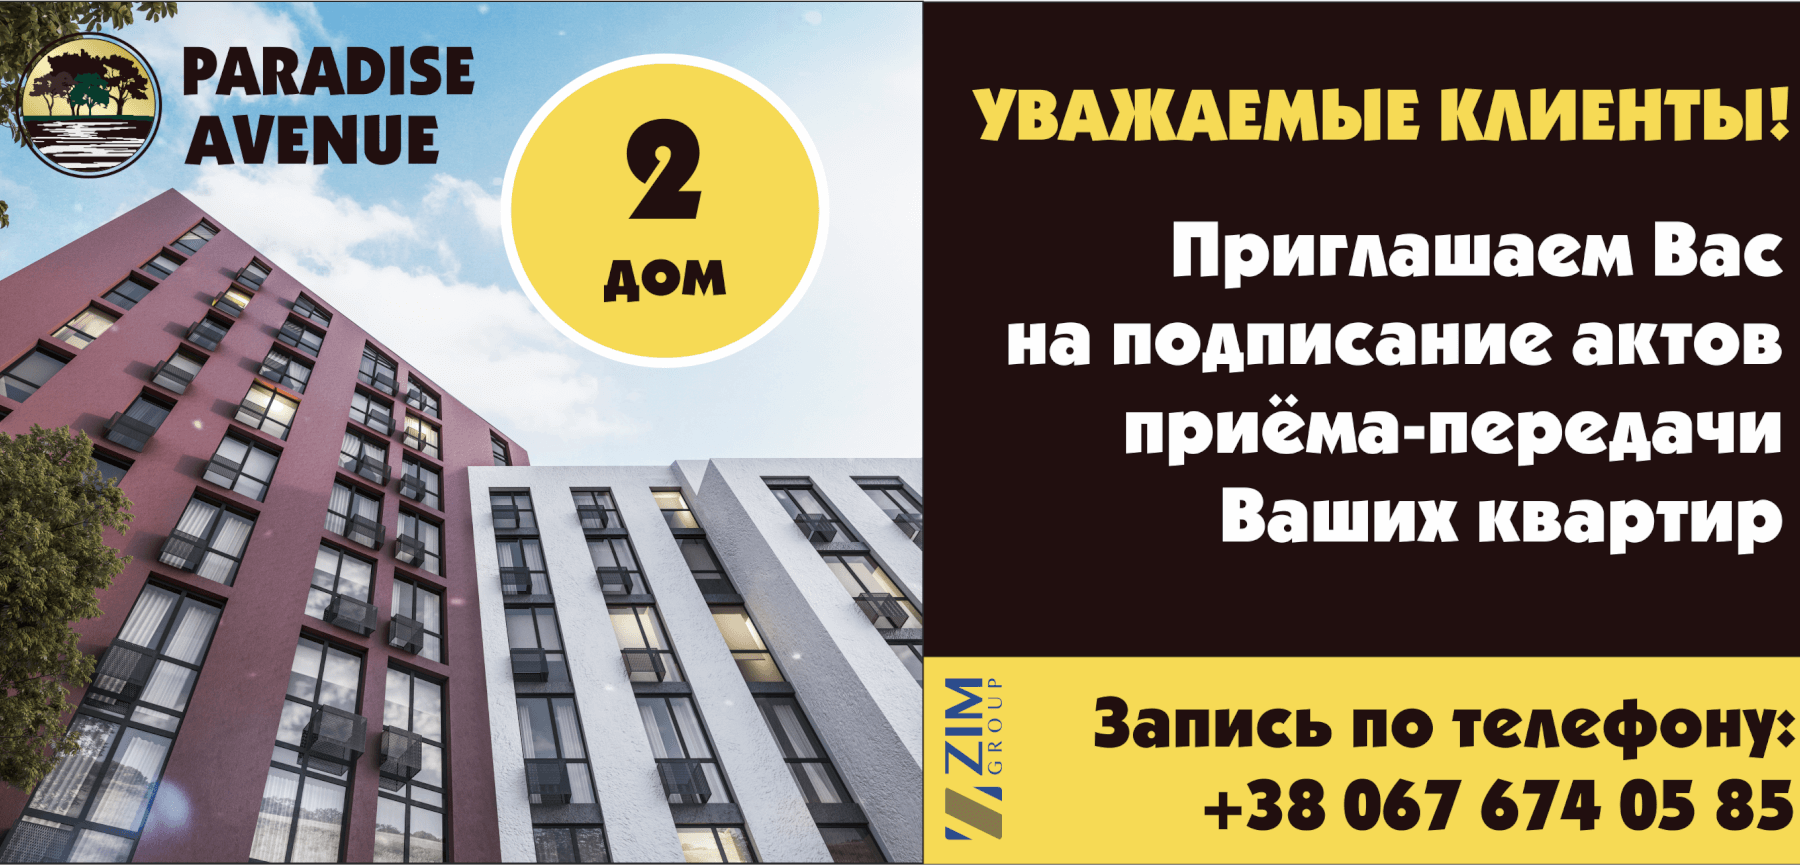 ФЕСТИВАЛЬ СПОРТУ В PARADISE AVENUE 25.05.2019